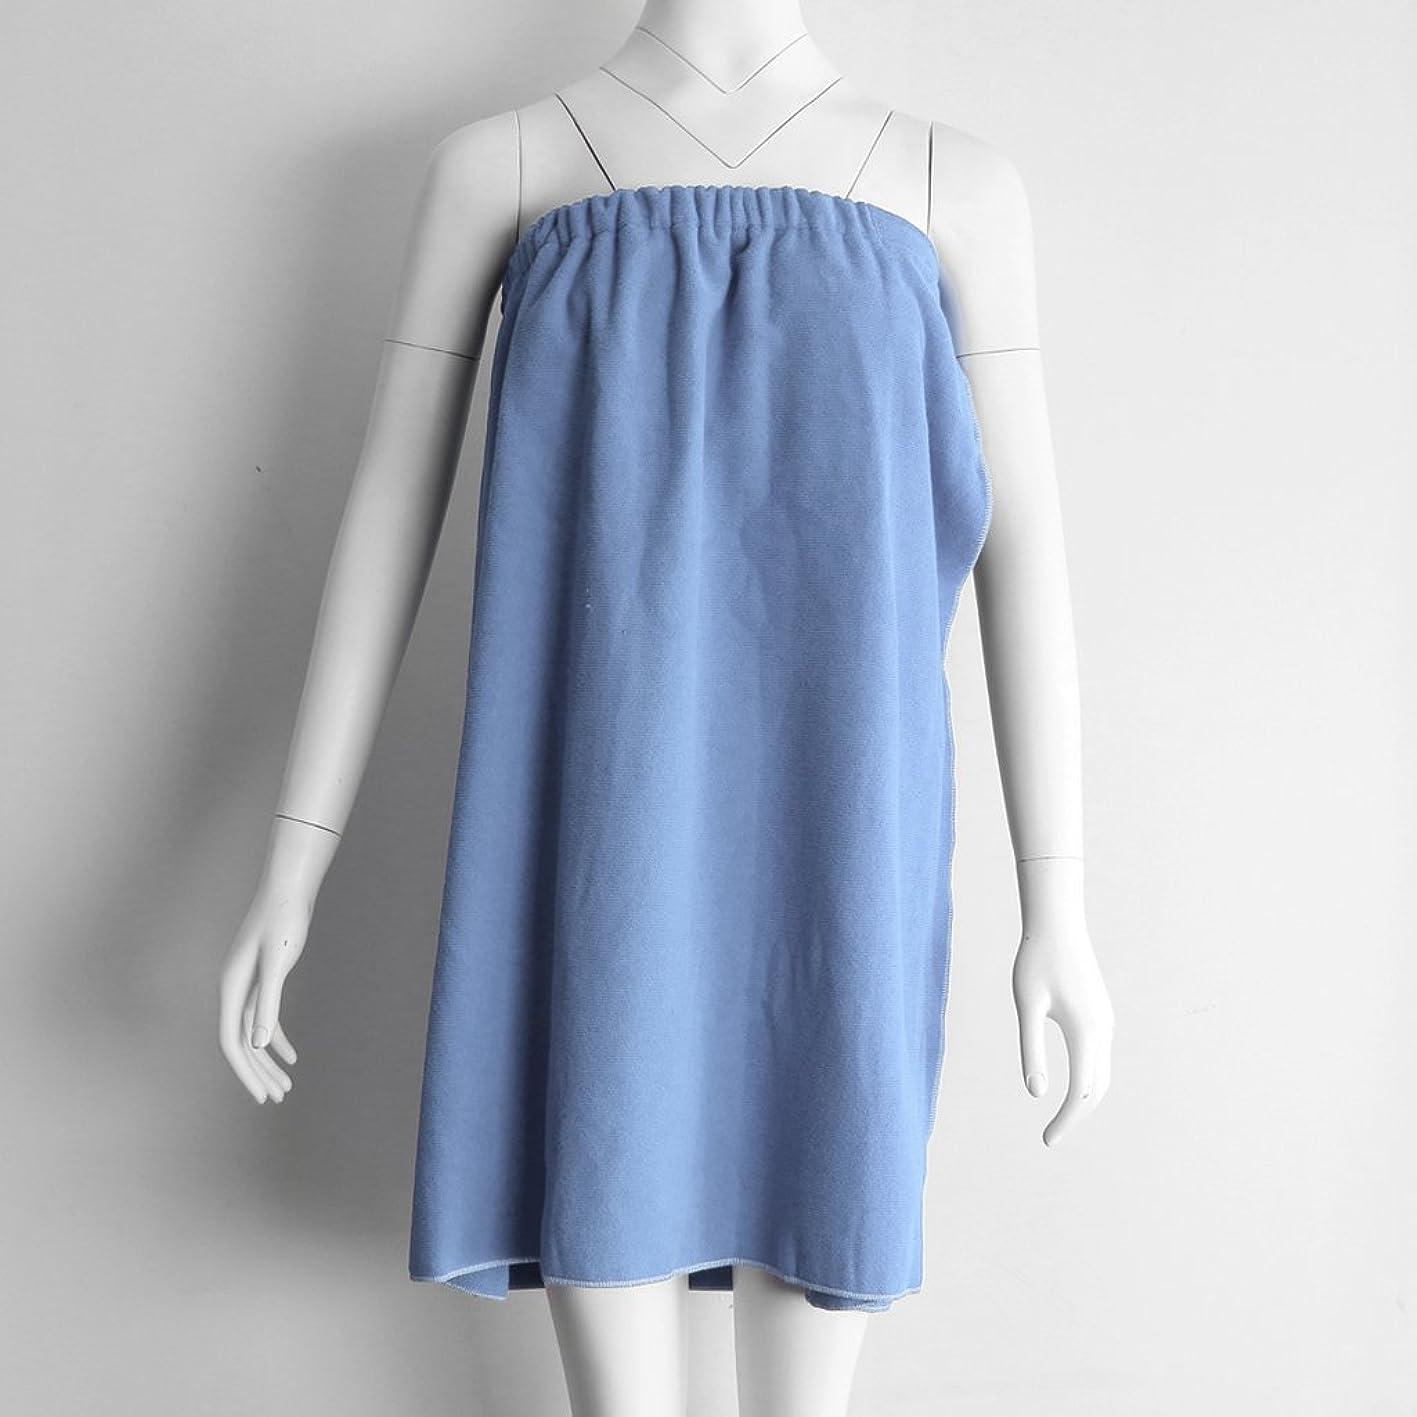 Baoblaze Comfort Women's Wrap Shower & Bath Spa Towel/Spa Shower Wrap/Bathrobe/Skirt -For Women - Light Blue oilyyuaevbi396